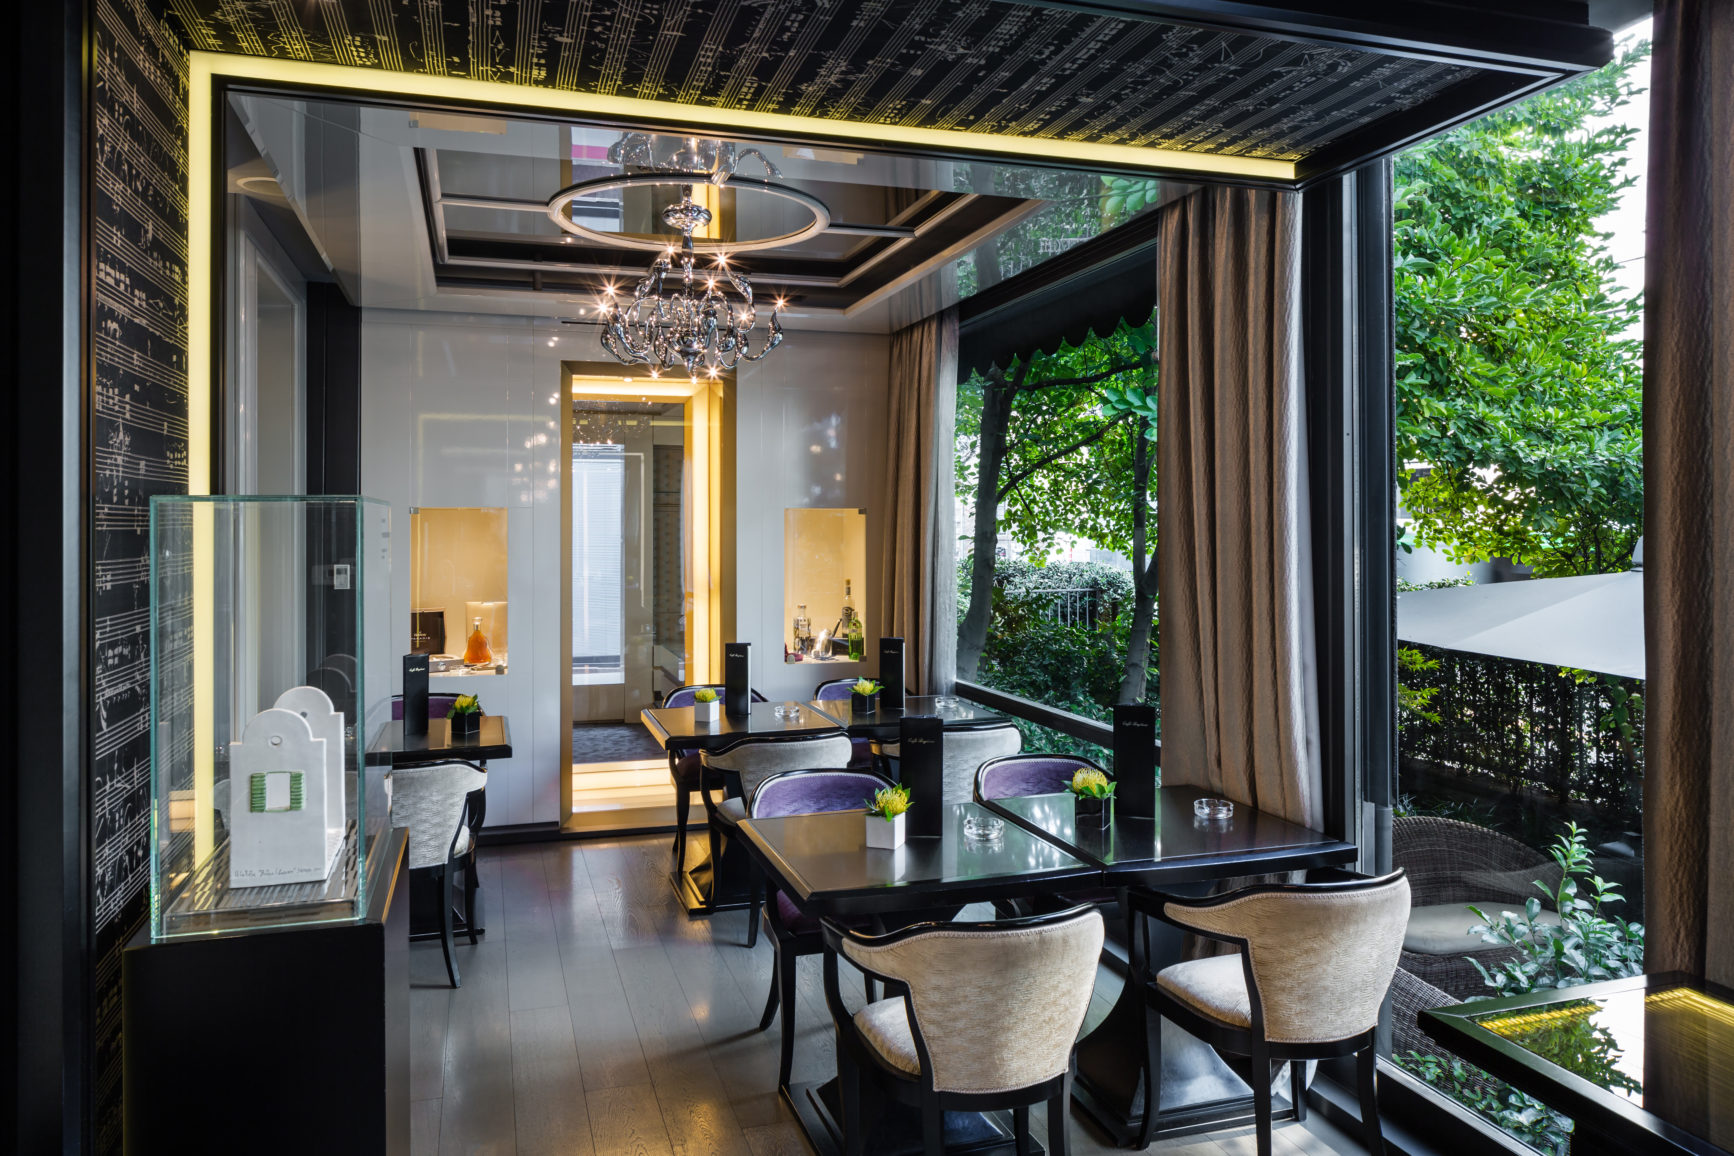 Baglioni Hotel Carlton Milano Terrace DiegoDePol e1557946877689 - Baglioni. Что-то новенькое